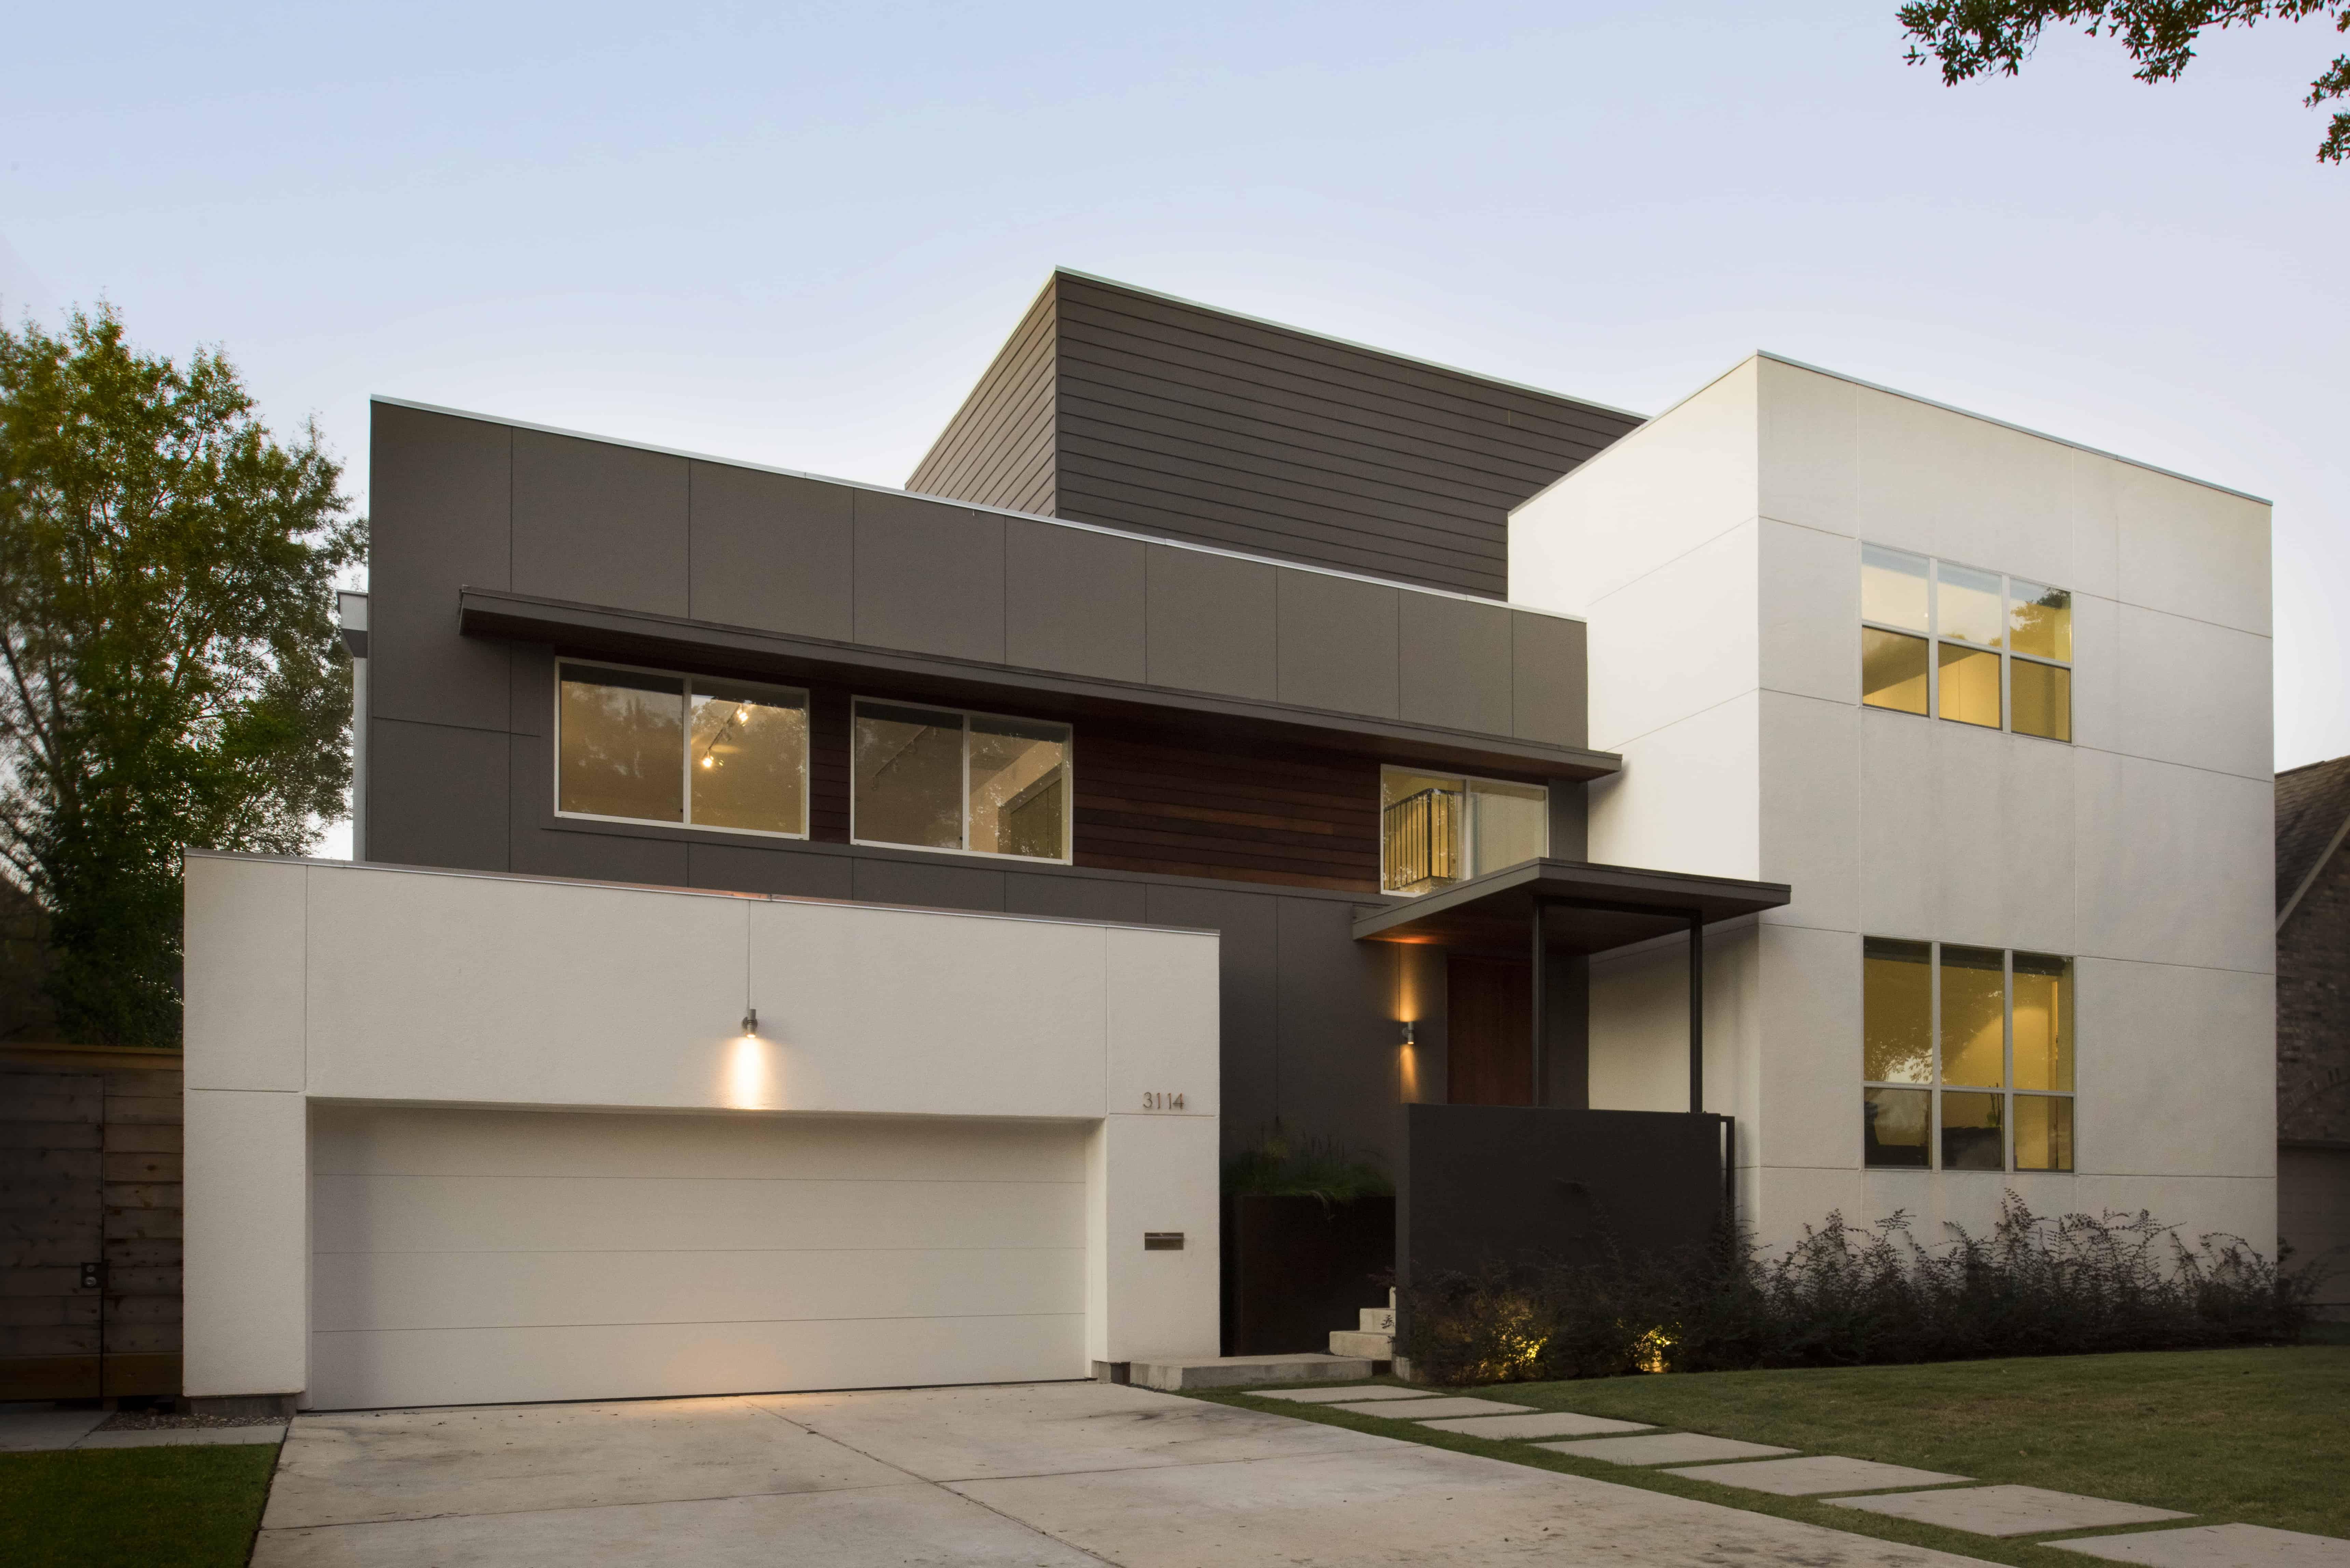 modern home raised to prevent flooding braeswood houston